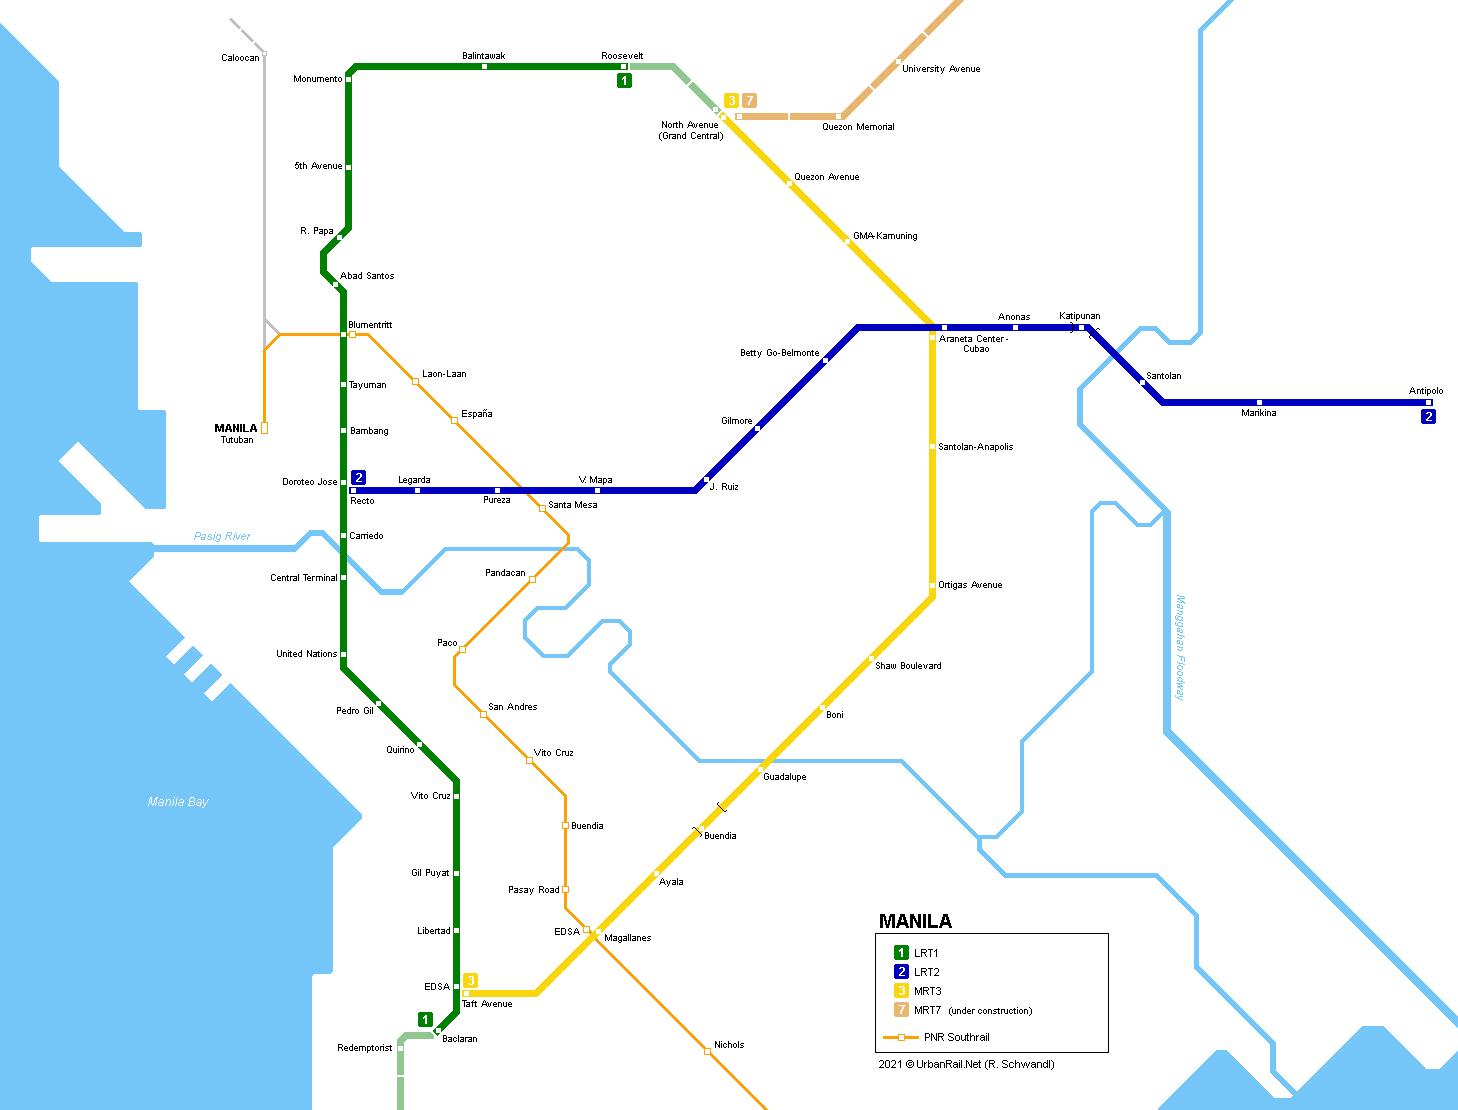 UrbanRail Net > Asia > Philippinges > Manila LRT & Metro